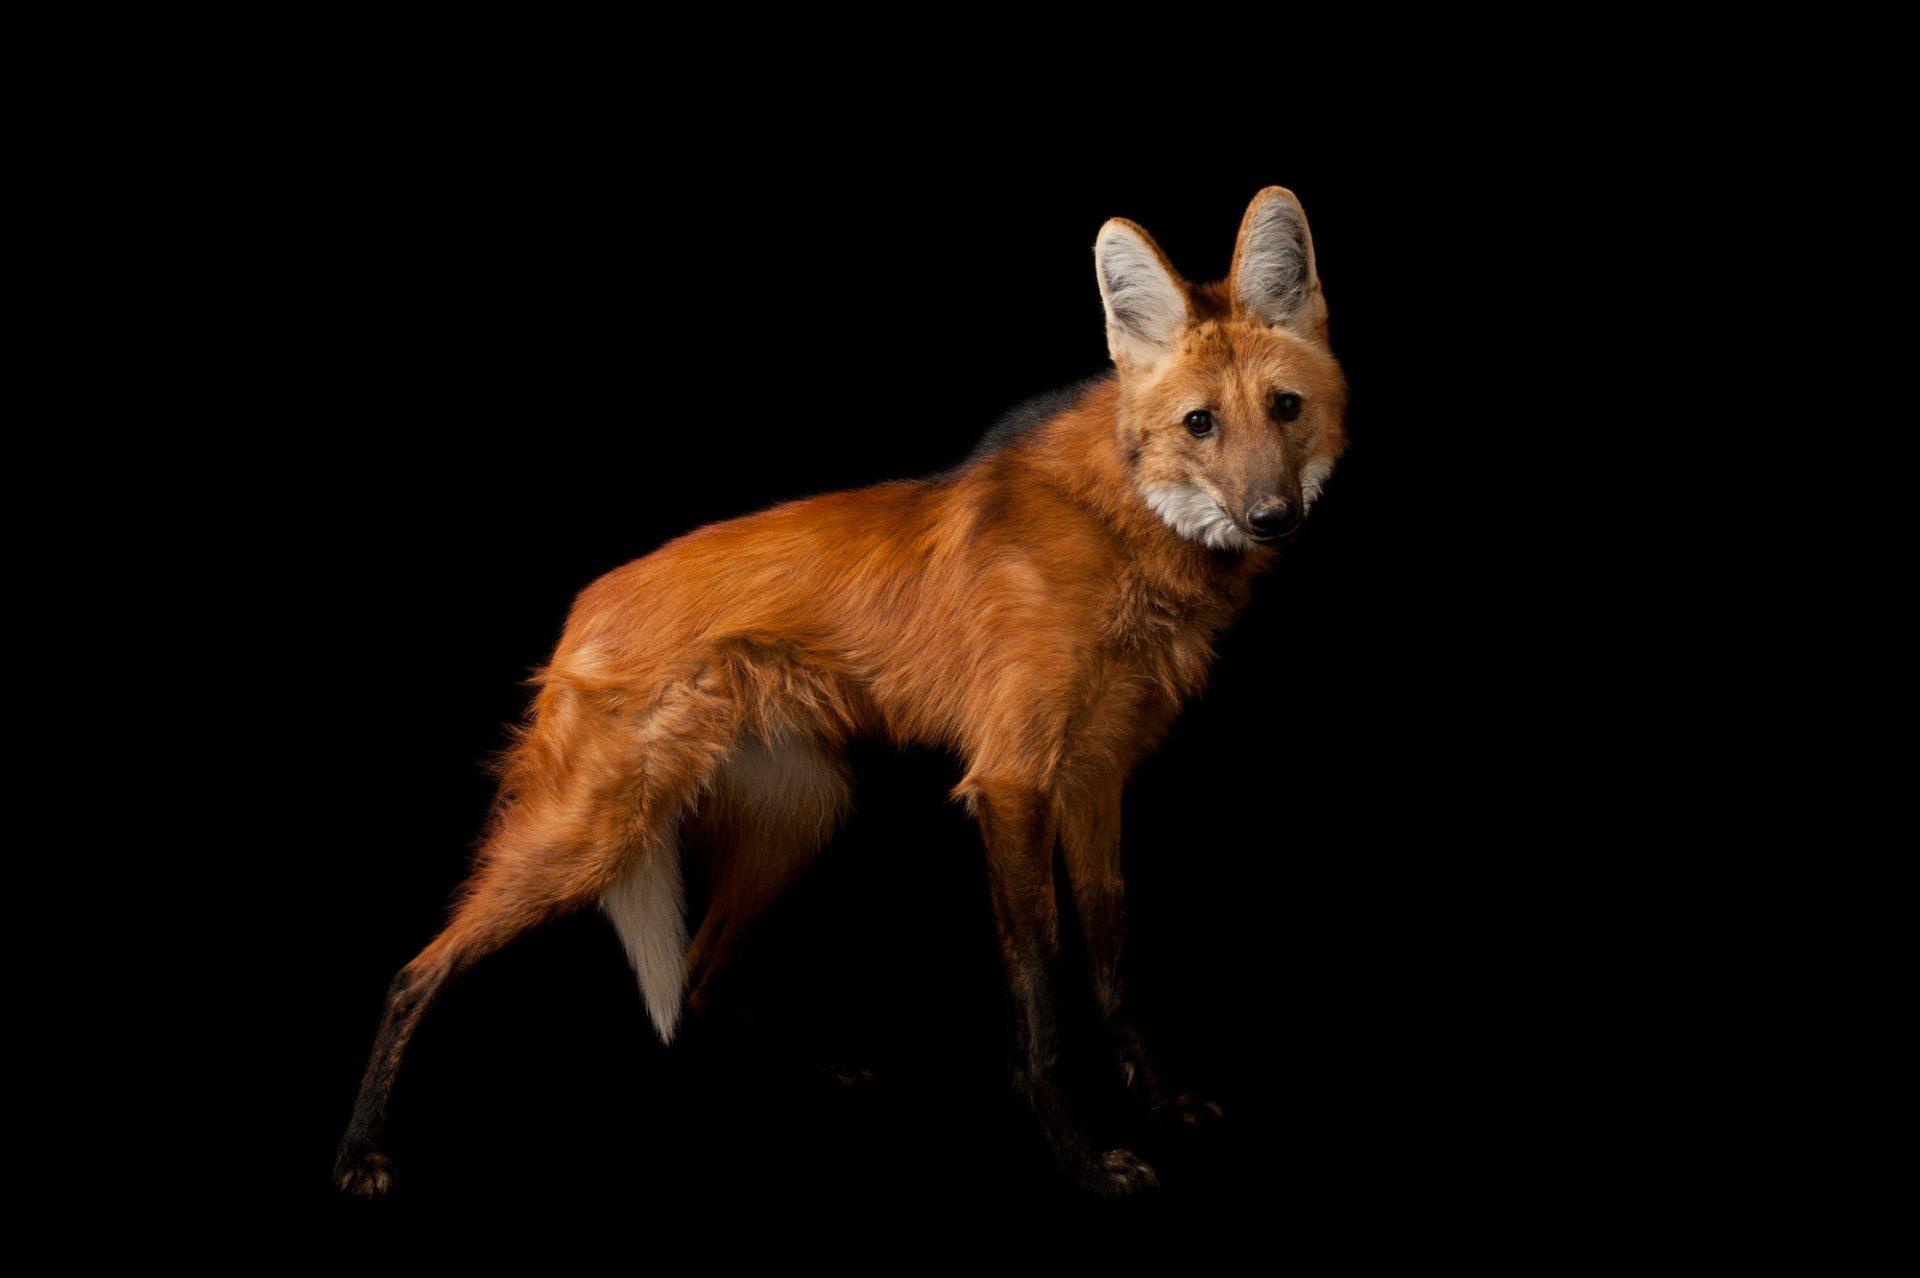 A federally endangered maned wolf (Chrysocyon brachyurus) at the Sunset Zoo.